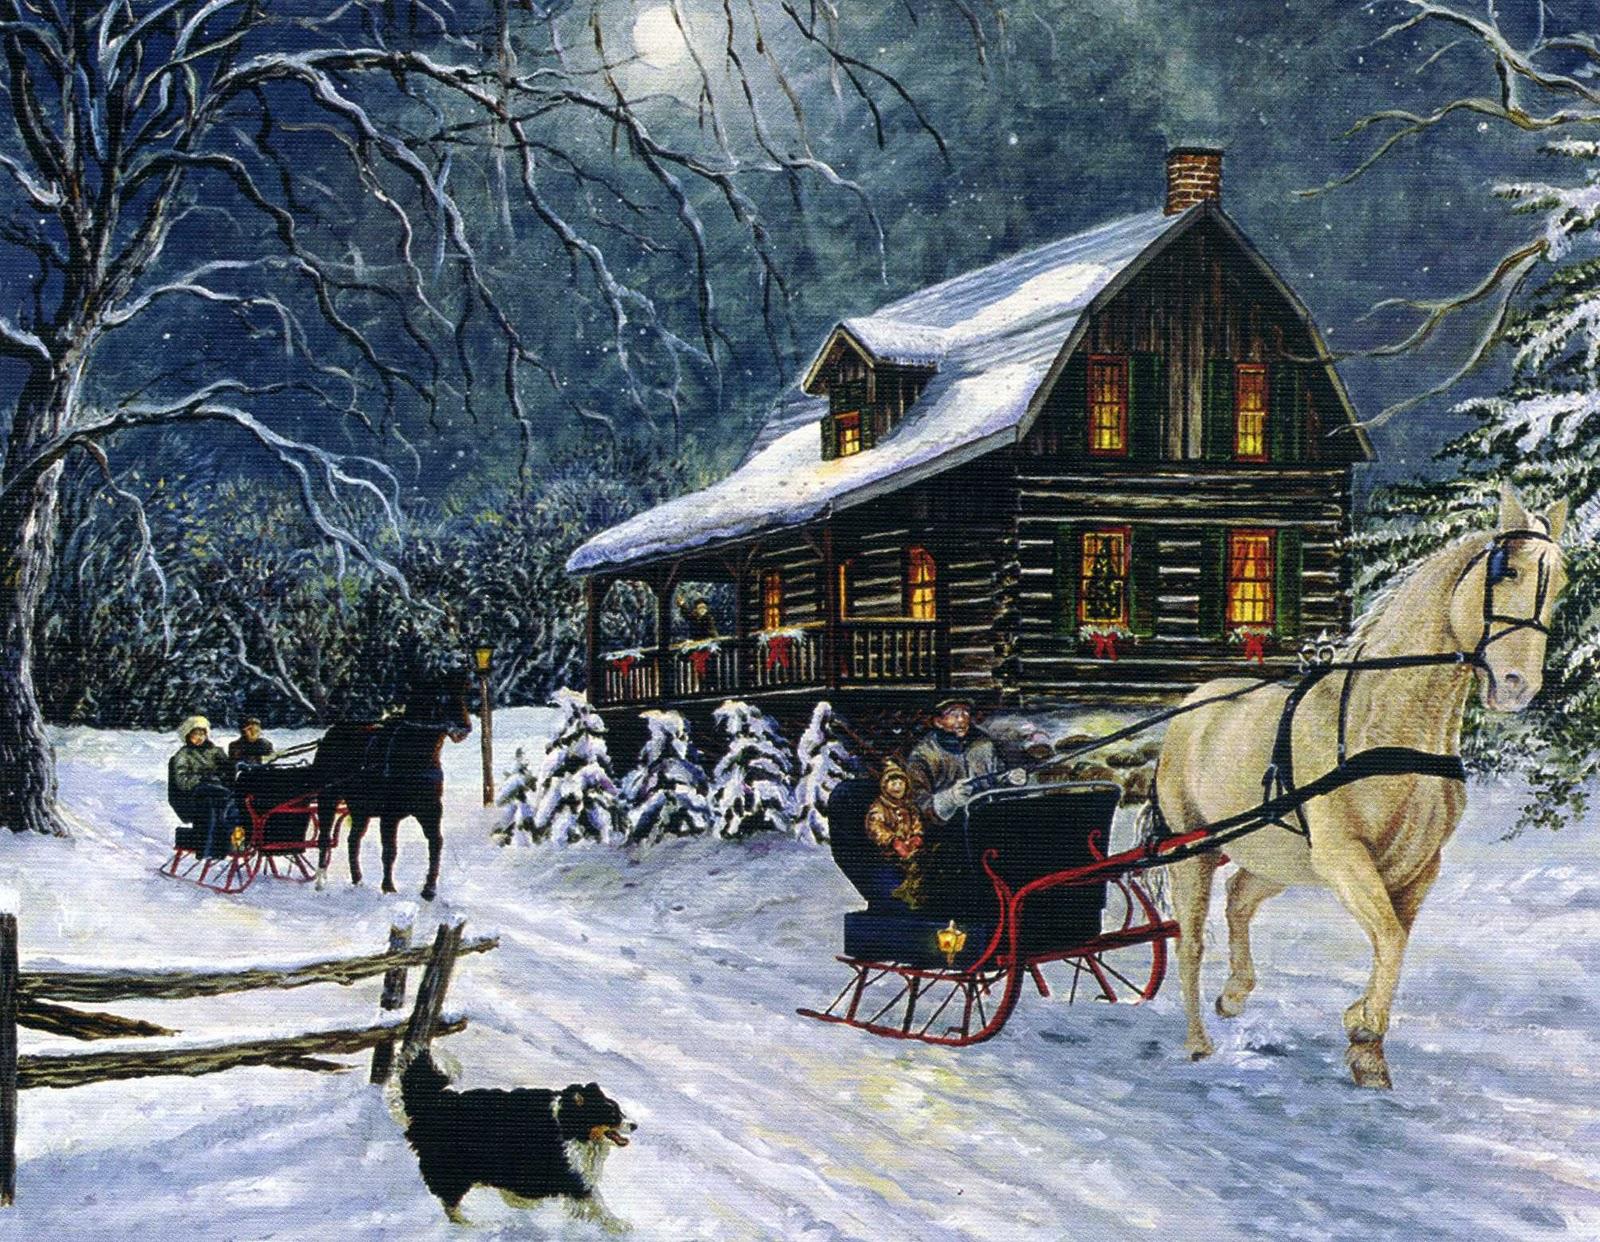 old cabin winter scene wallpaper - photo #23